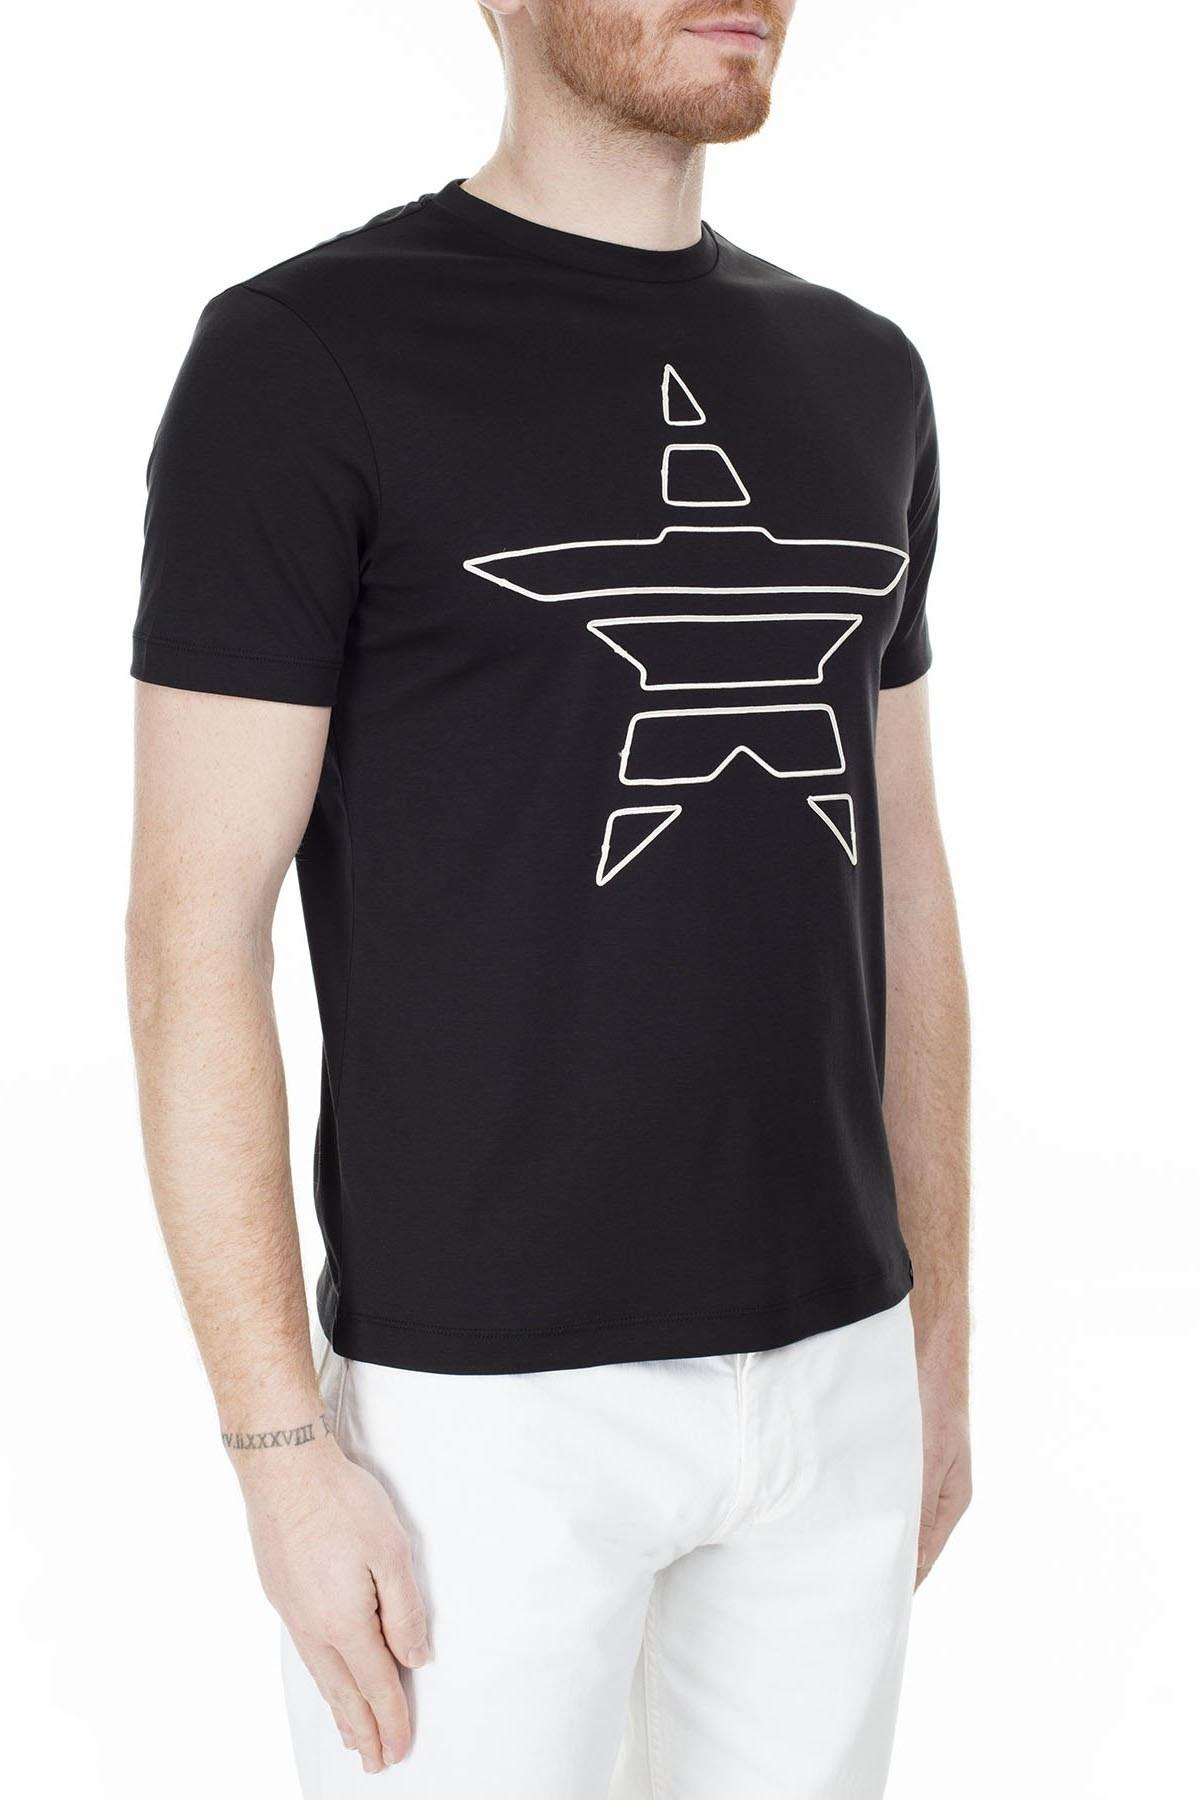 Emporio Armani Erkek T Shirt S 6G1TE2 1JPRZ 0002 SİYAH